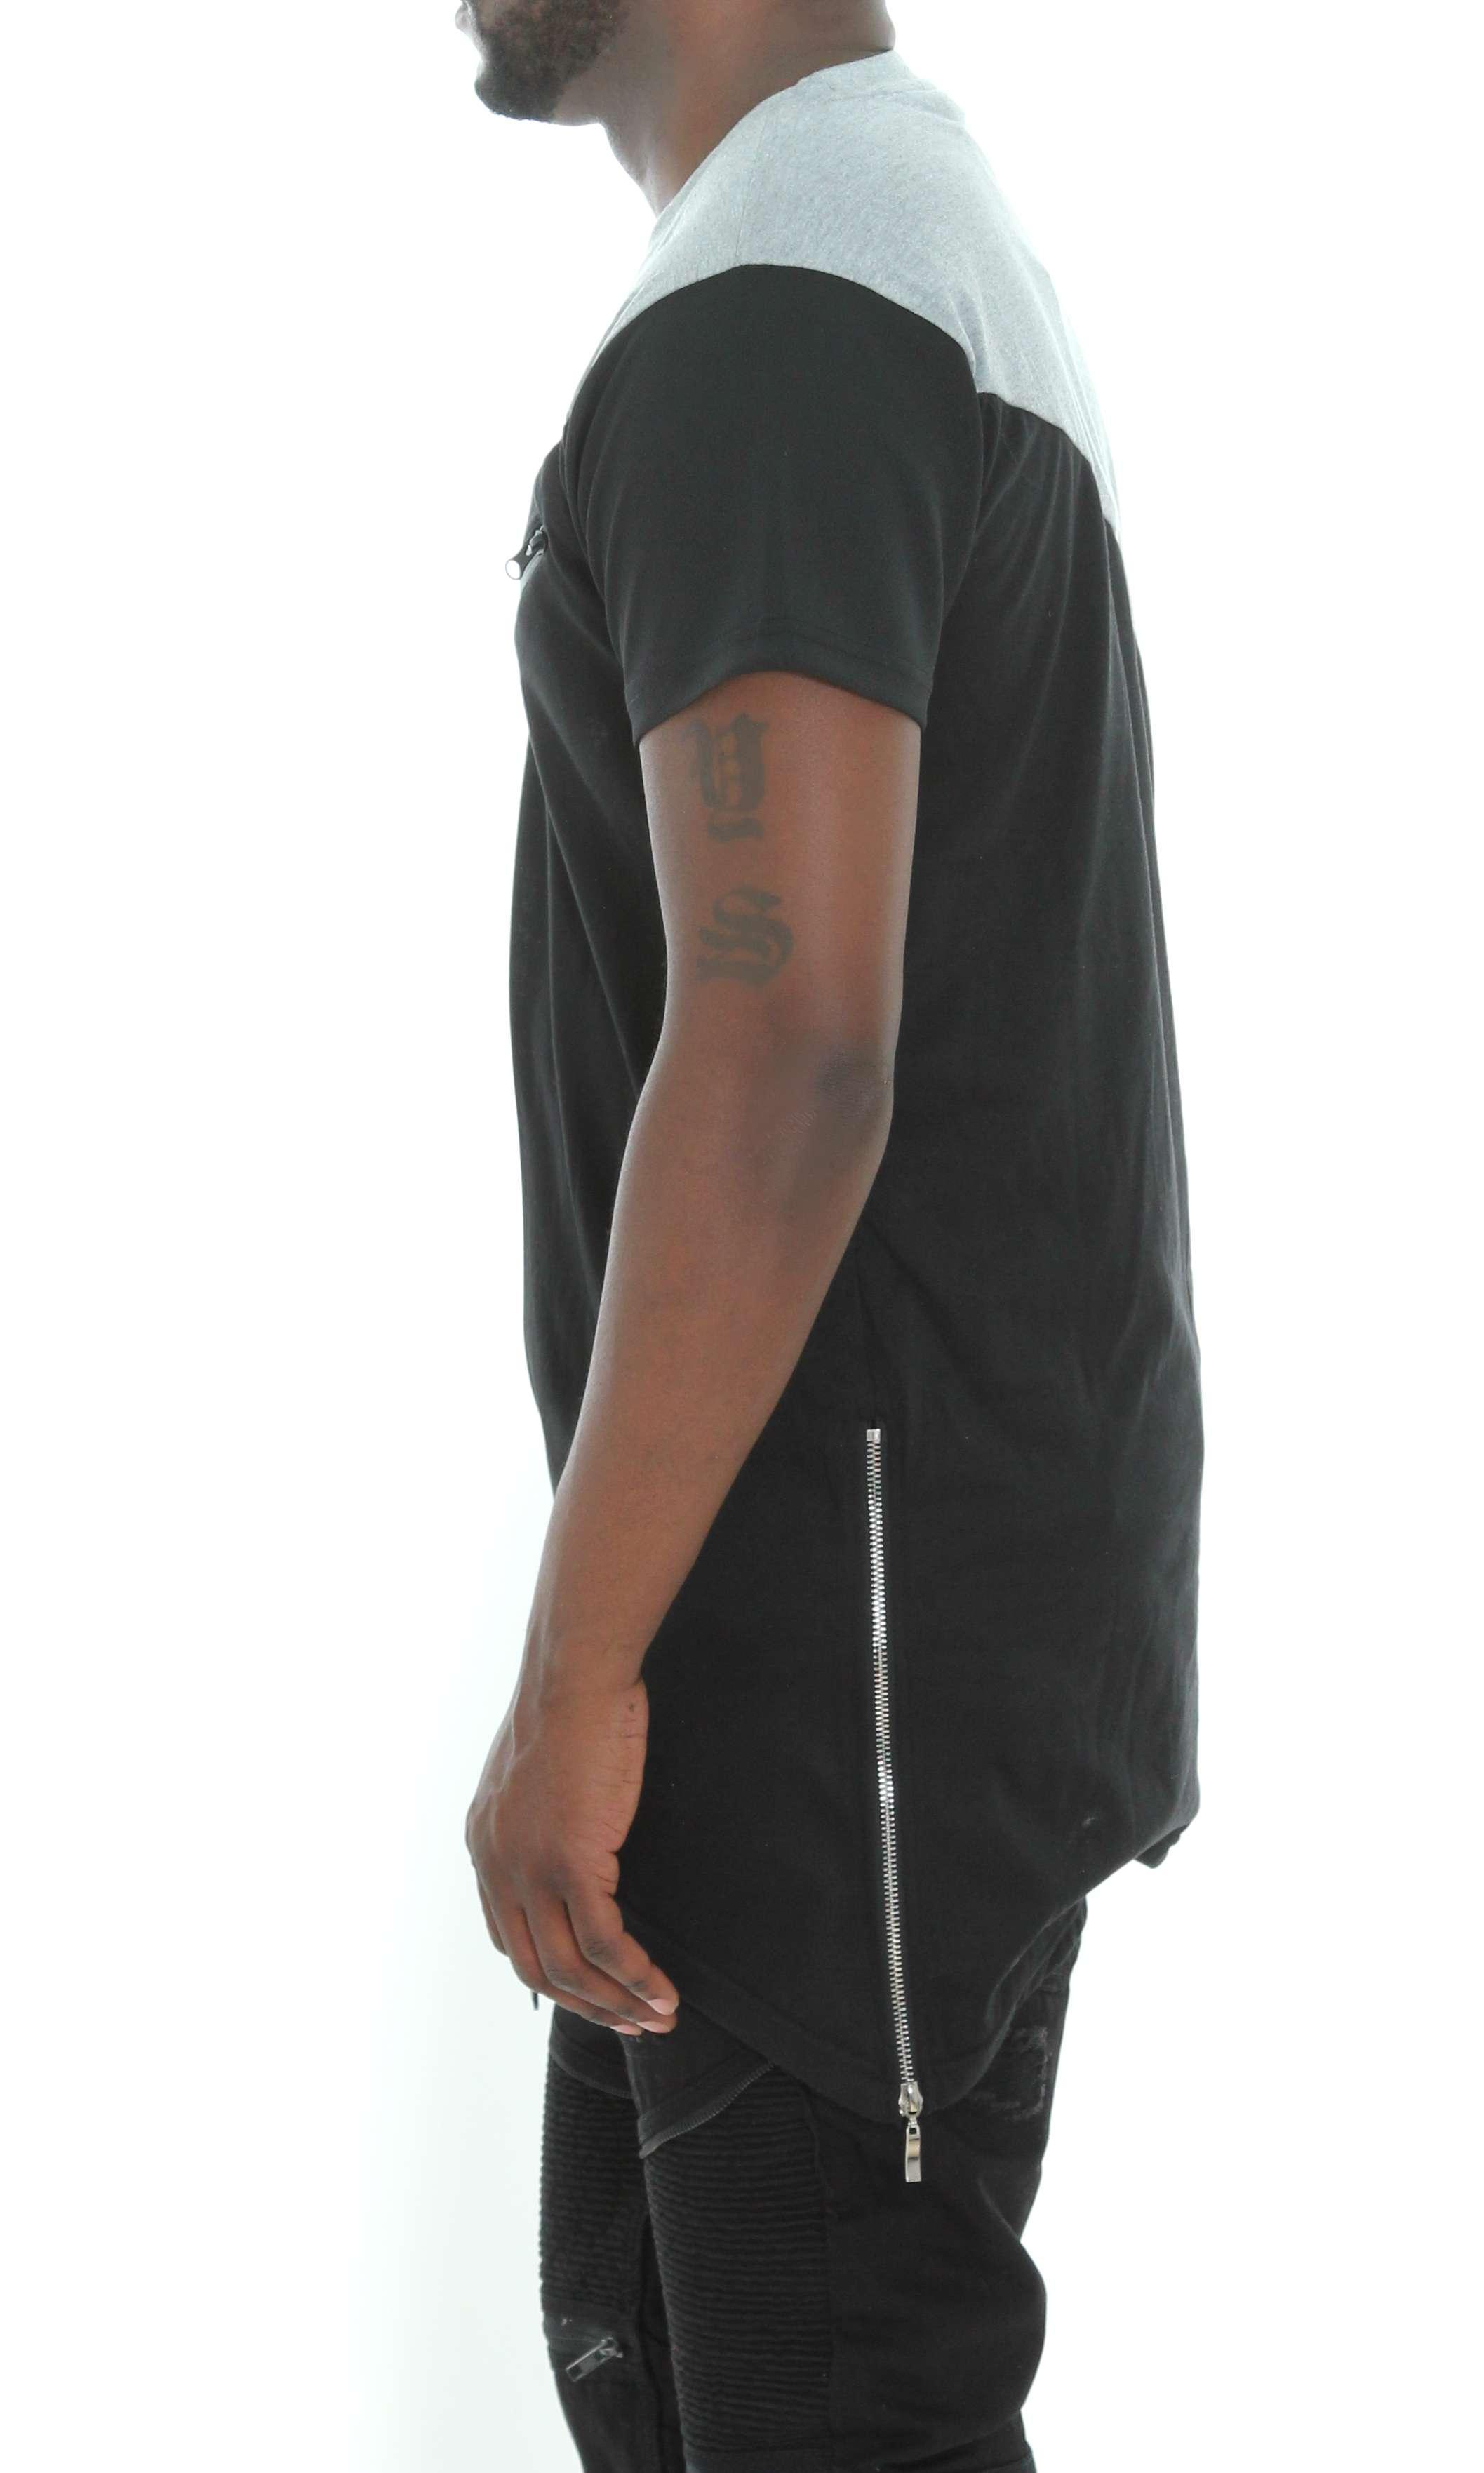 Imperious-Men-039-s-Colorblock-Asymmetric-Hem-Side-Zipper-Longline-T-Shirt thumbnail 7